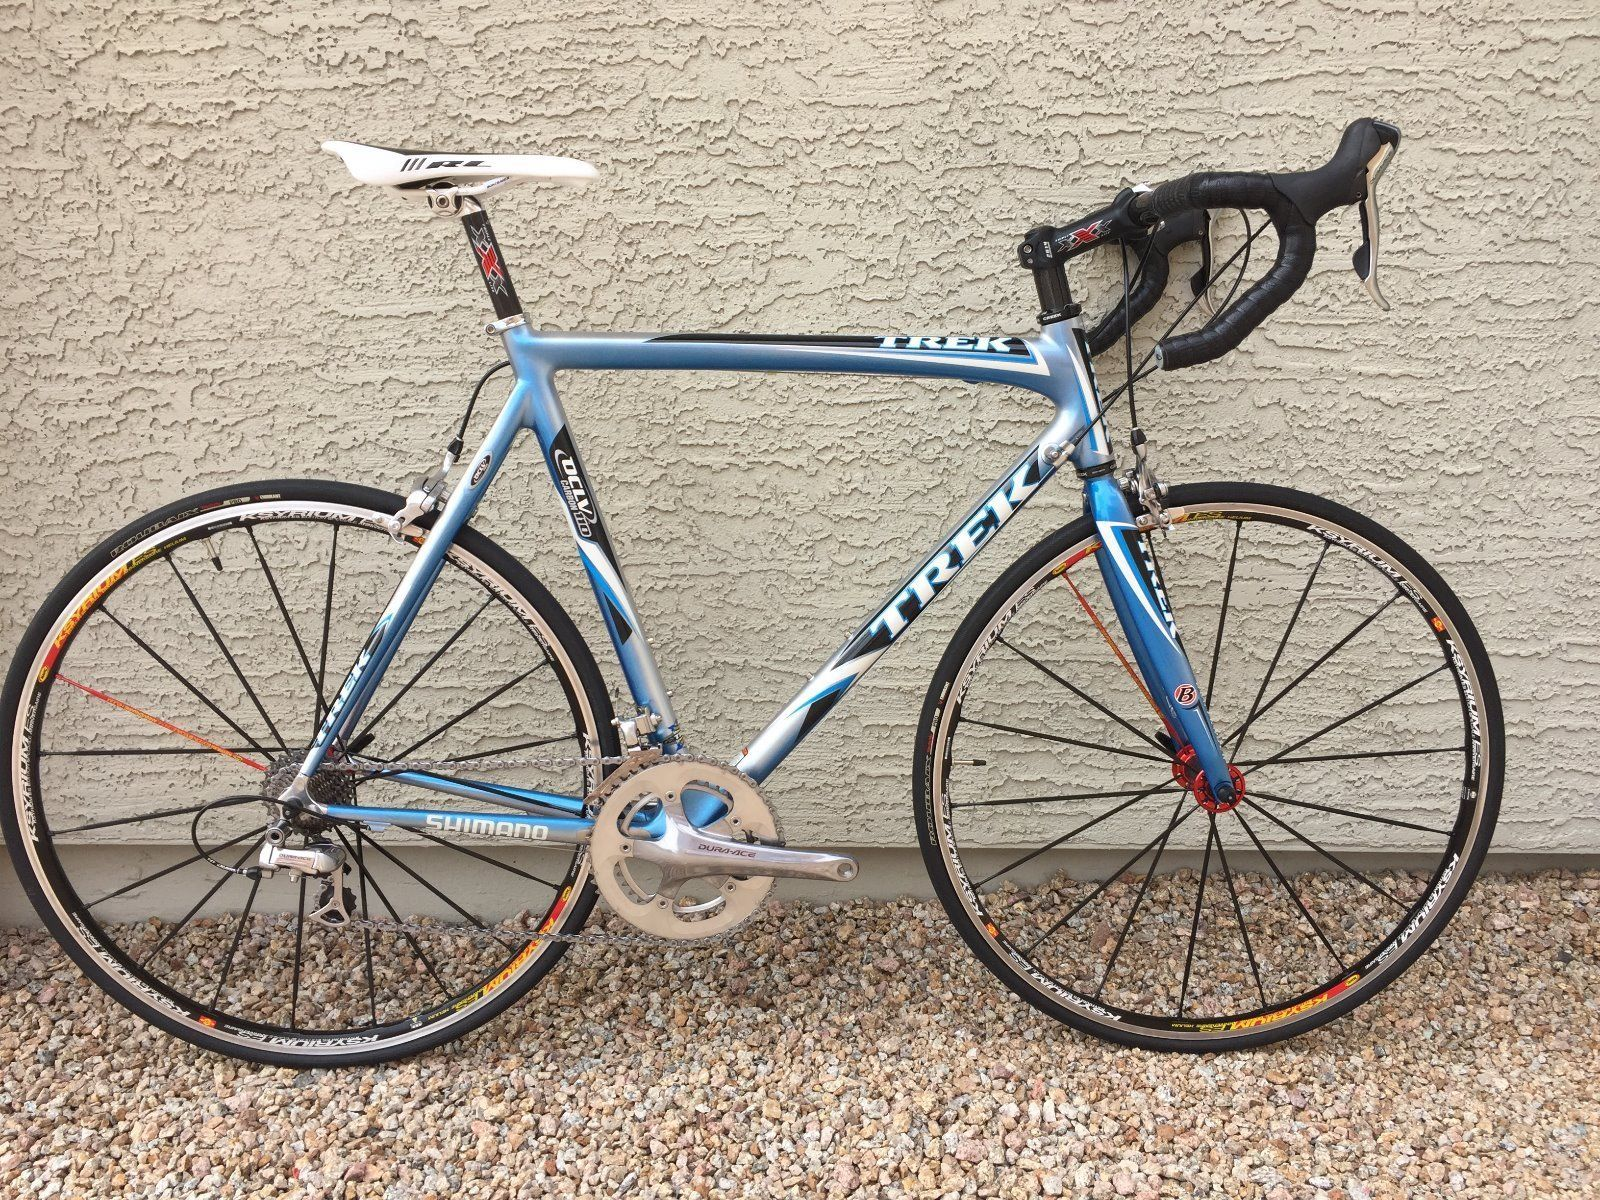 Trek Madone 5 9 SL OCLV Carbon 110 Dura Ace Road Bike size